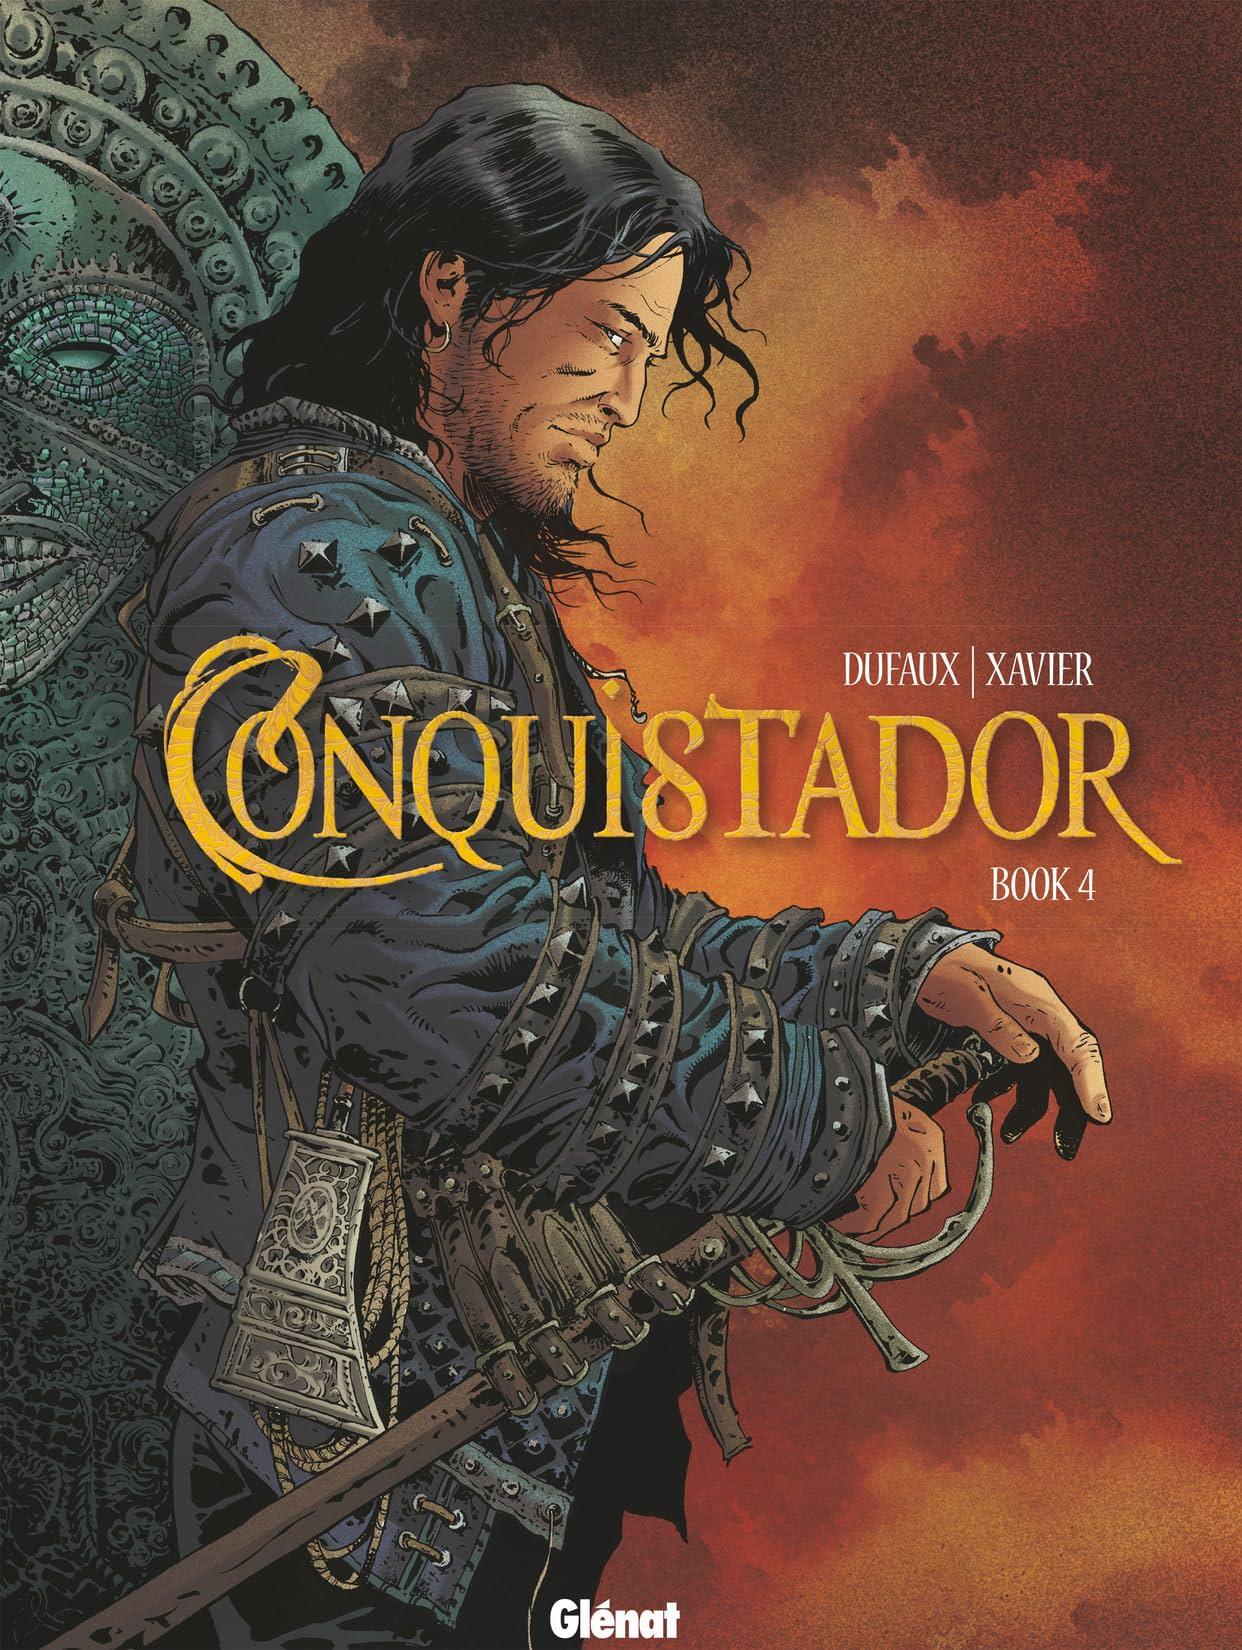 Conquistador Vol. 4